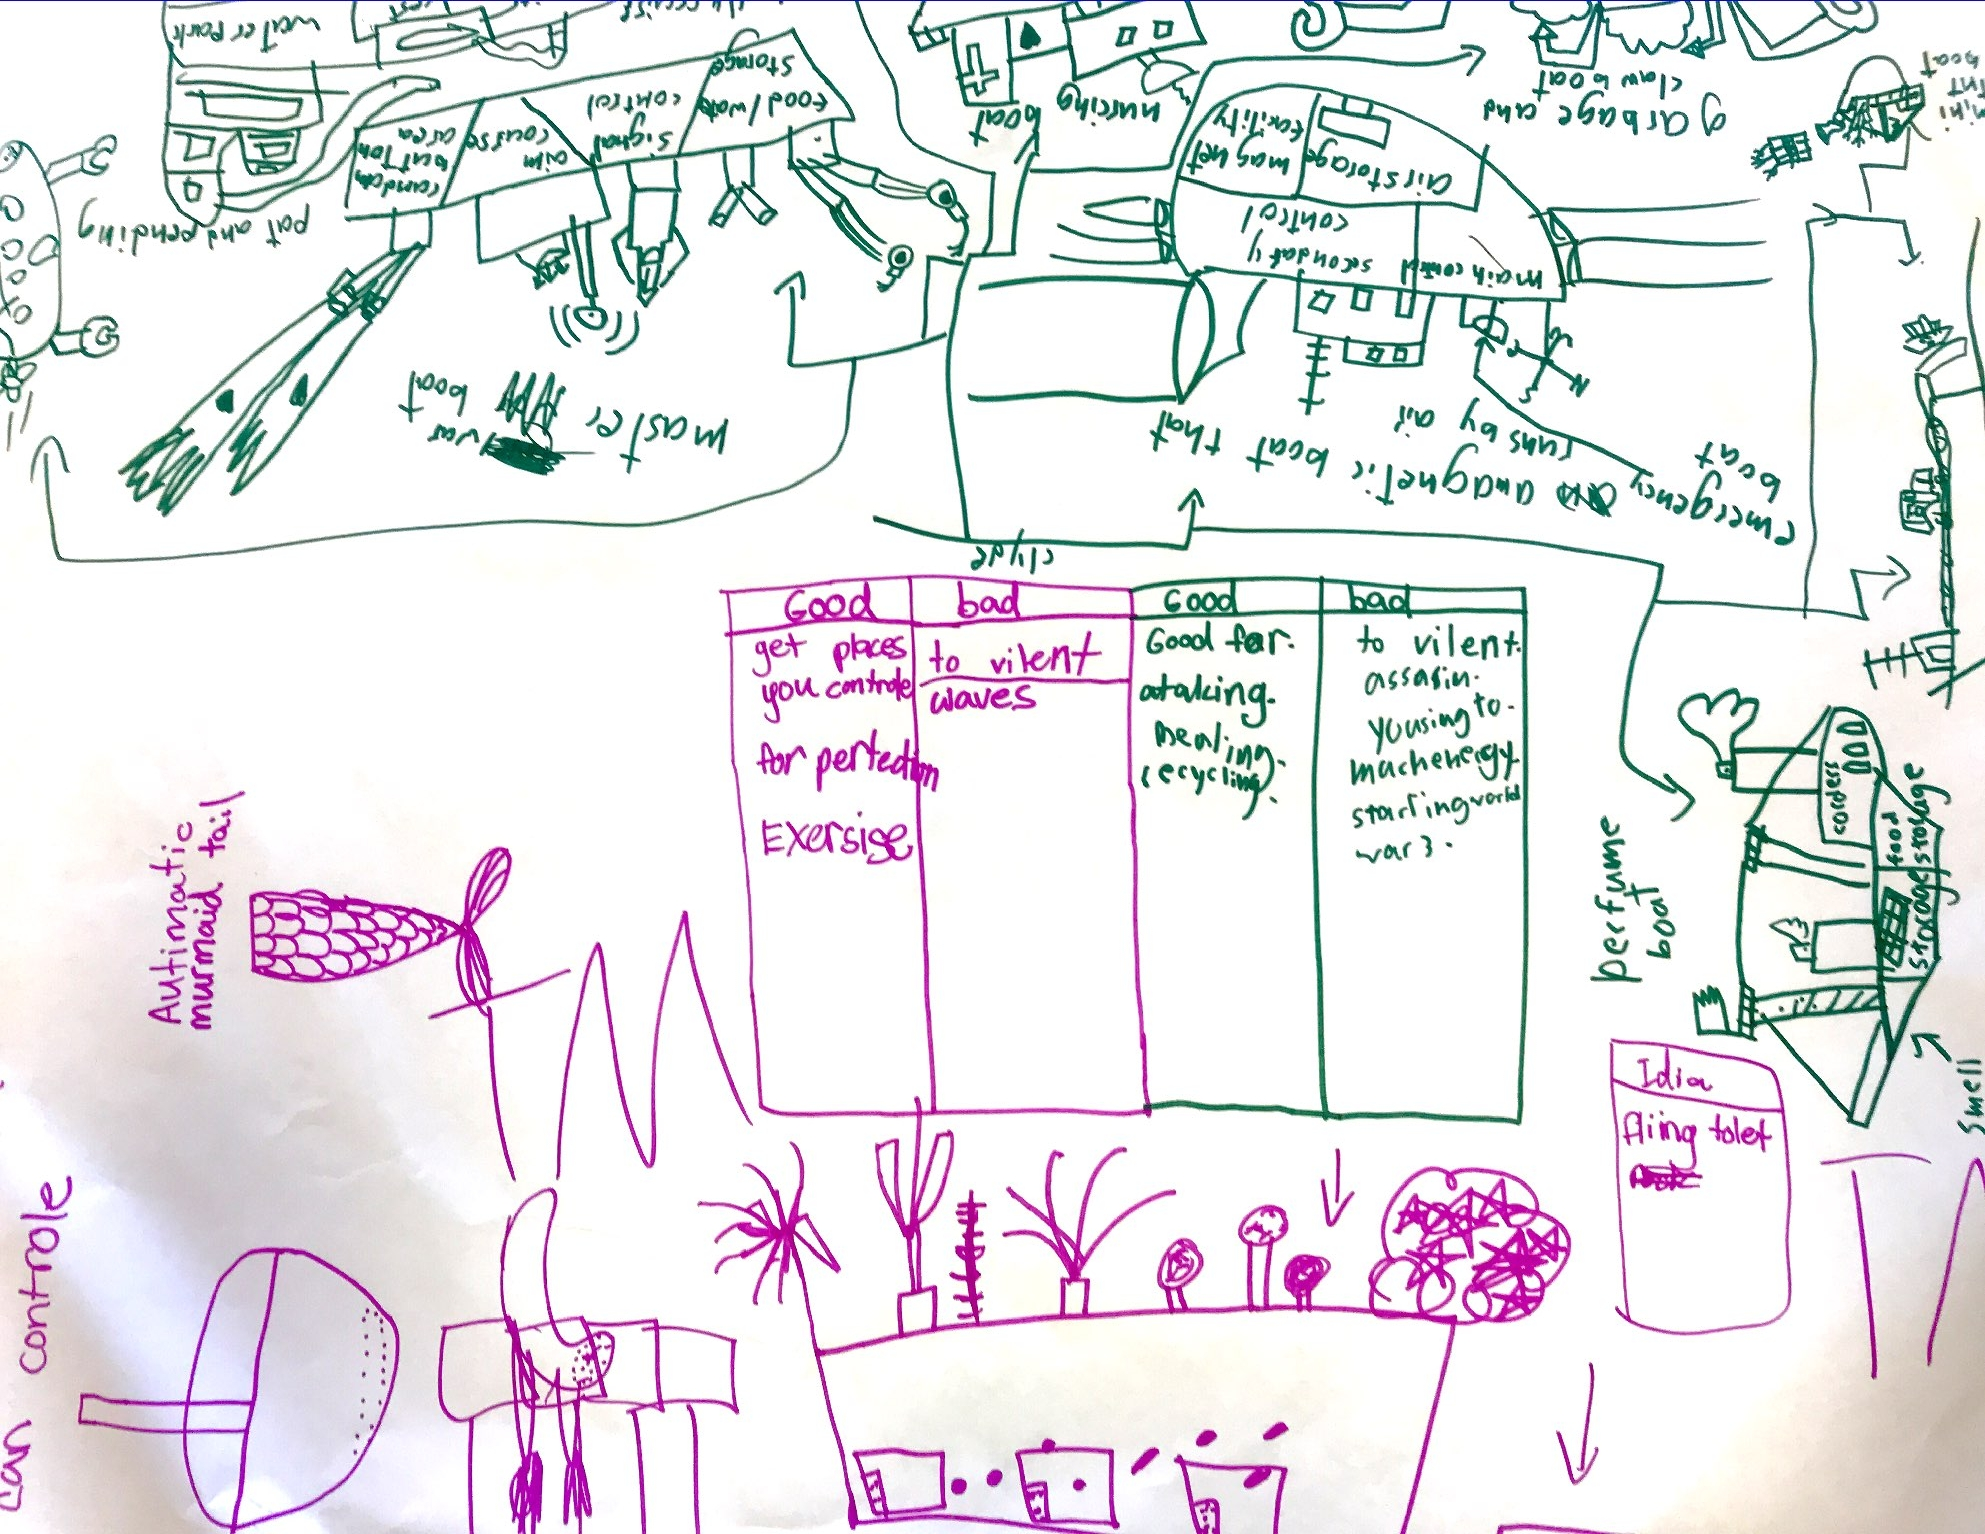 lower El innovation brainstorms-page-10.jpg